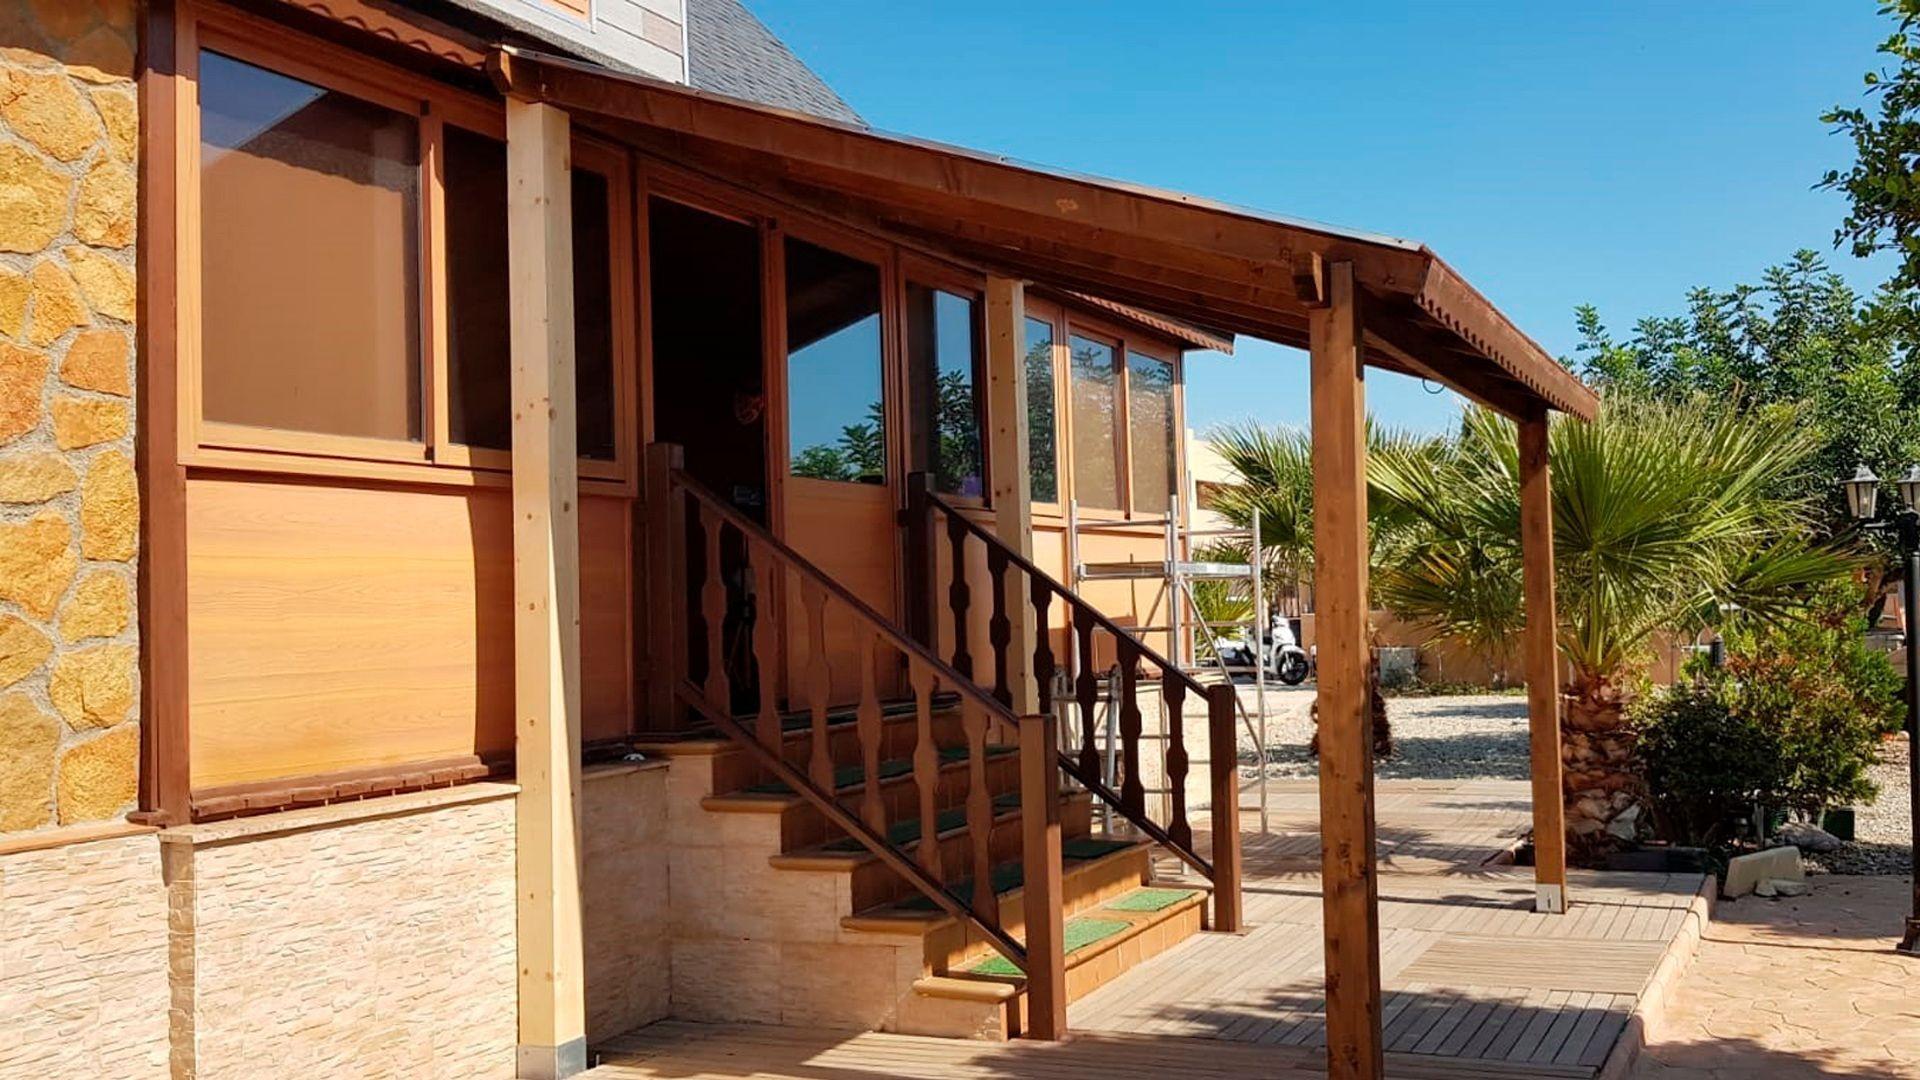 Empresa de carpintería en Almería